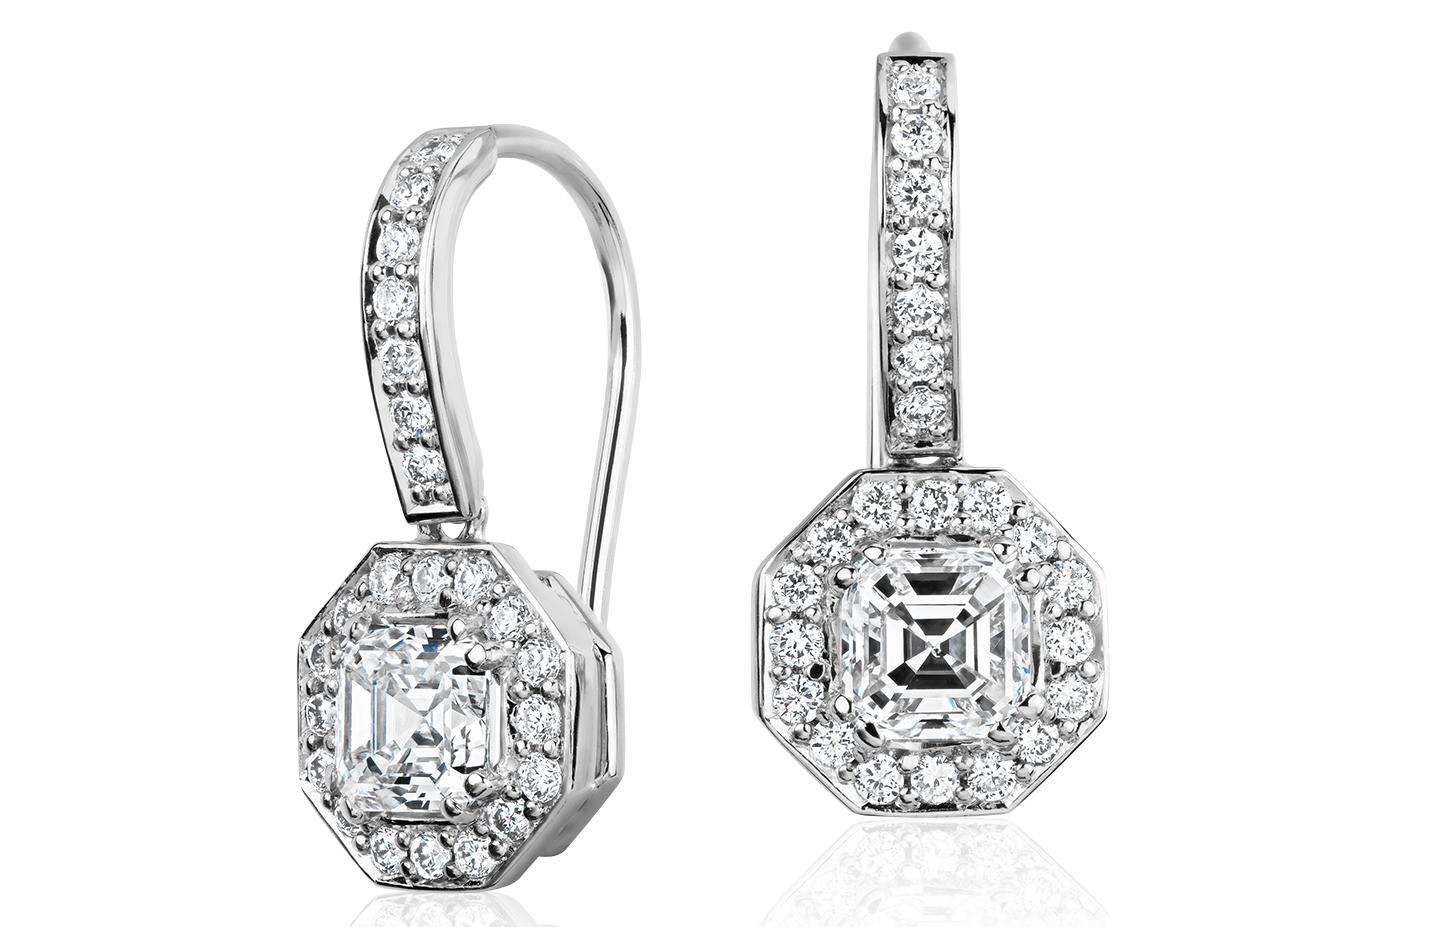 Aretes tipo argolla con diamantes de talla Asscher en oro blanco de 18 k (1 1/10 qt. total)